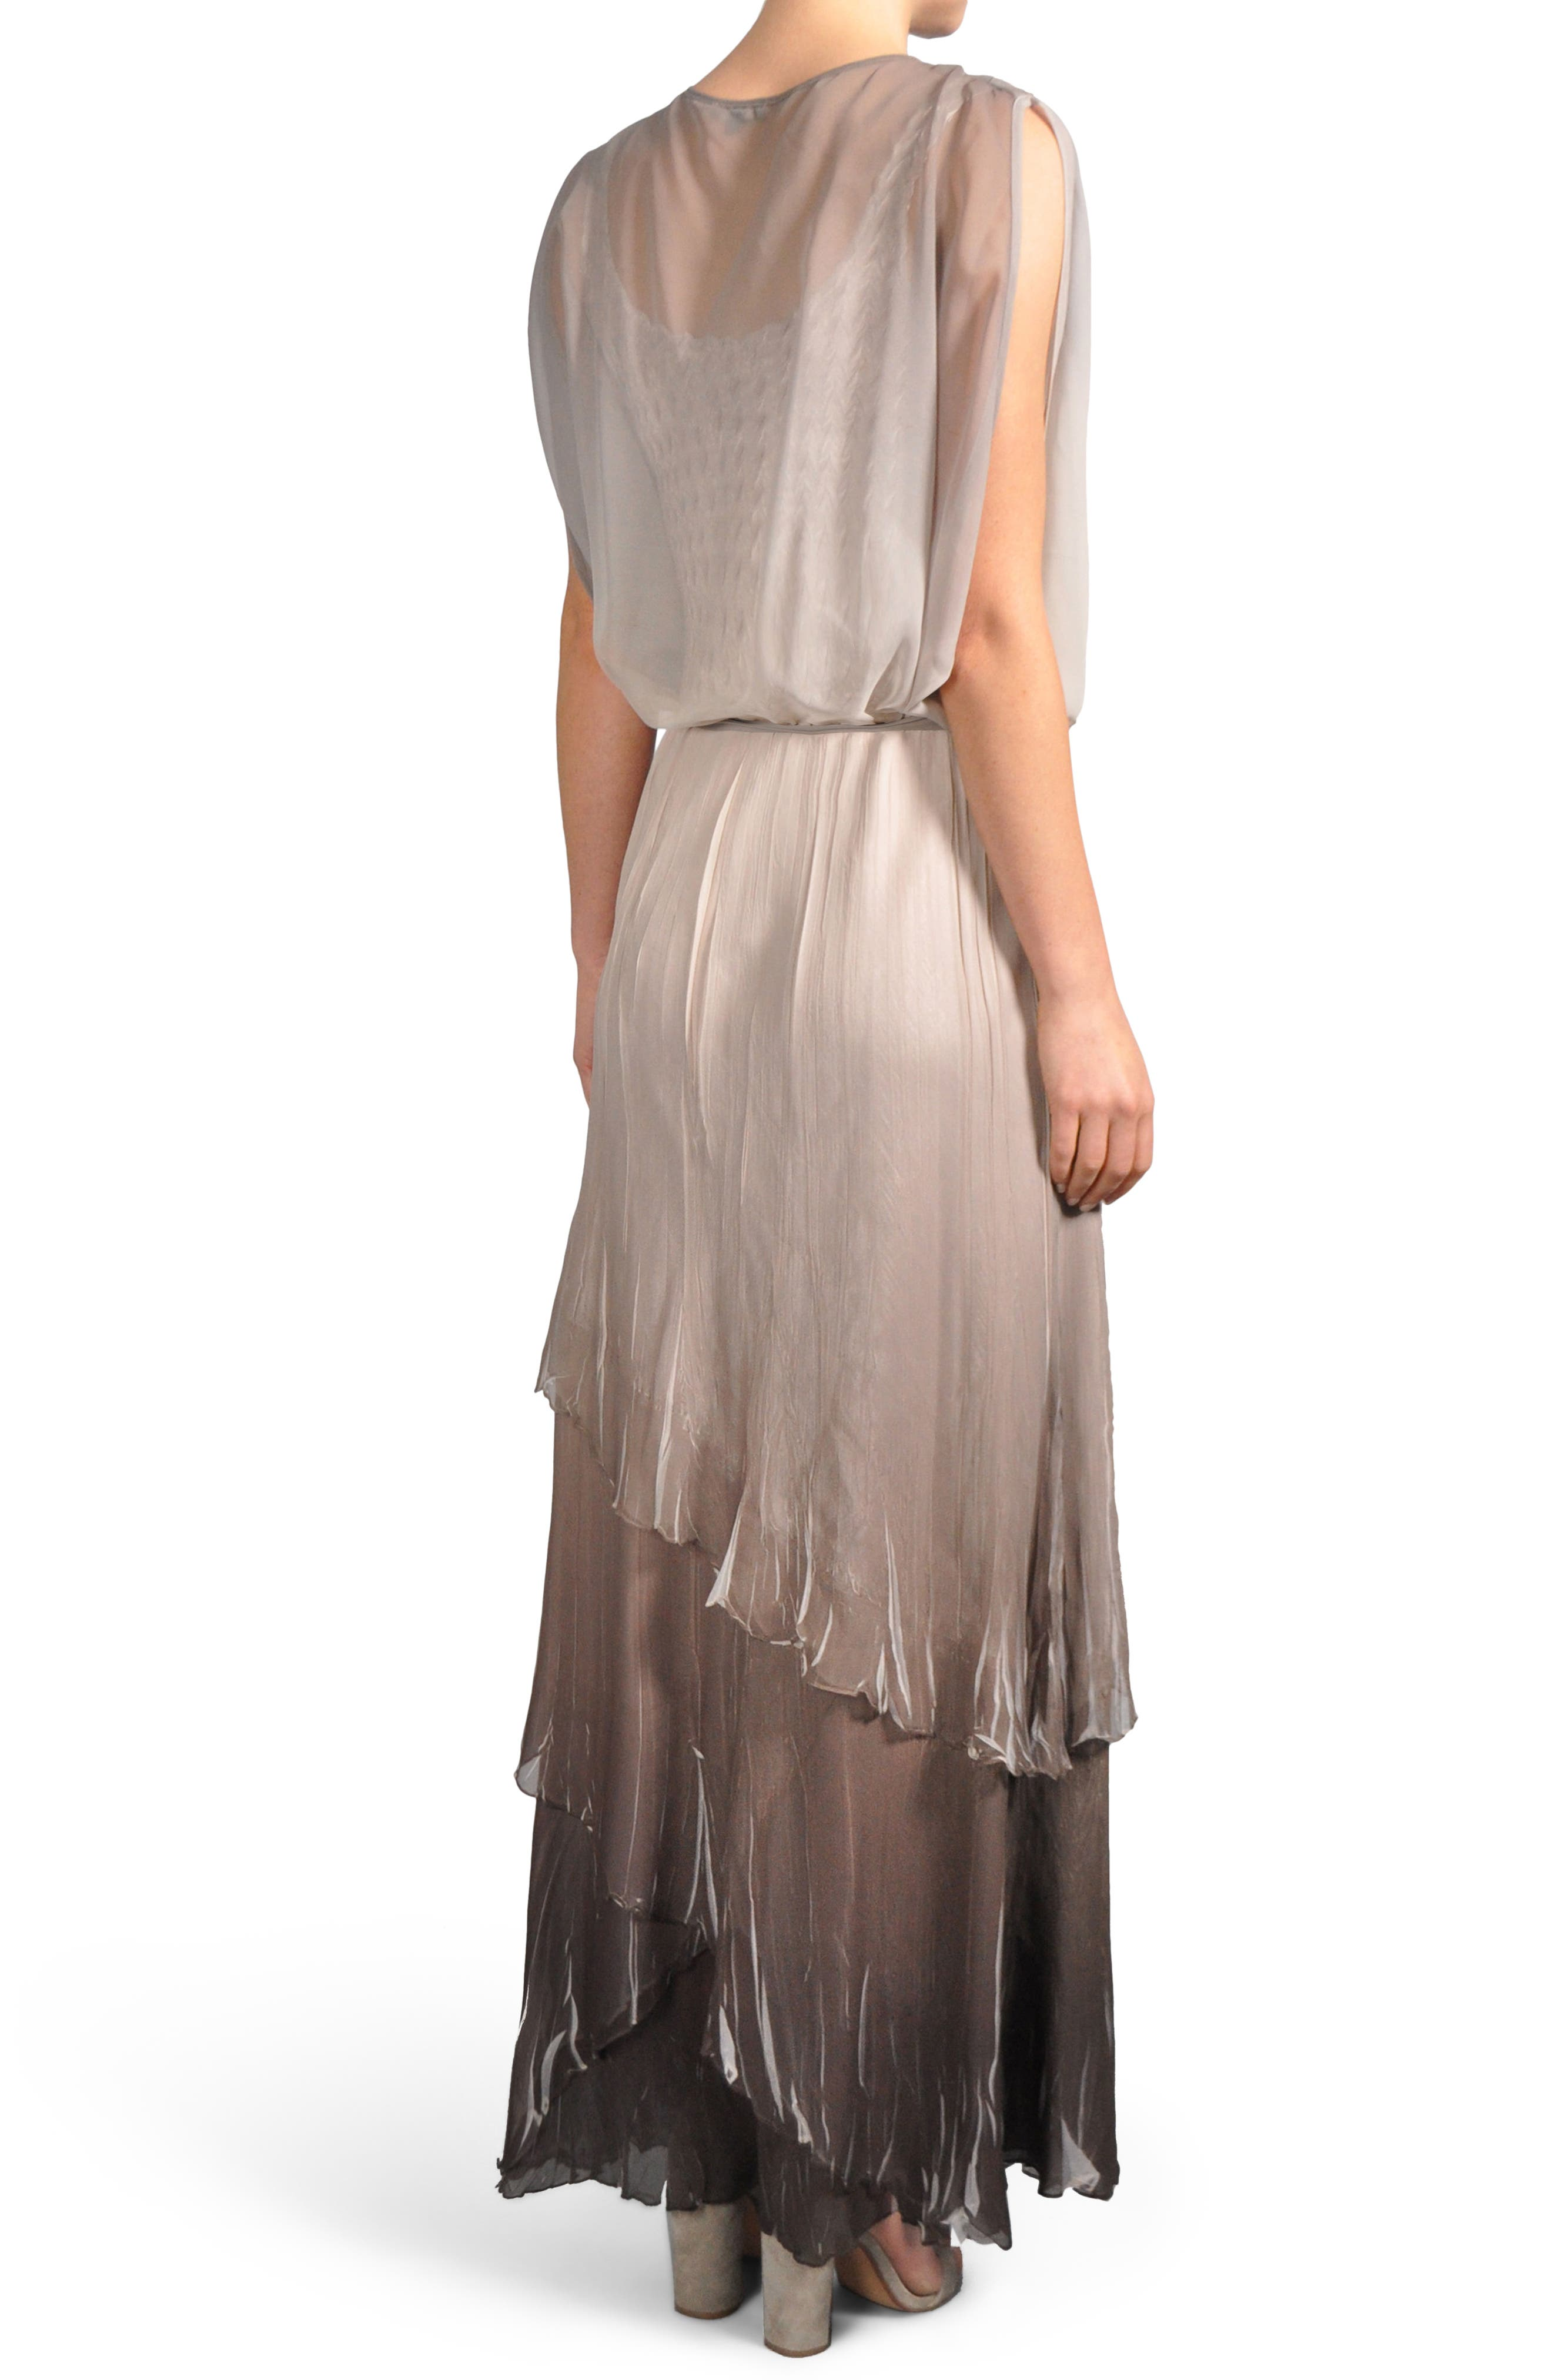 Ombré Tiered Skirt Blouson Gown,                             Alternate thumbnail 2, color,                             057